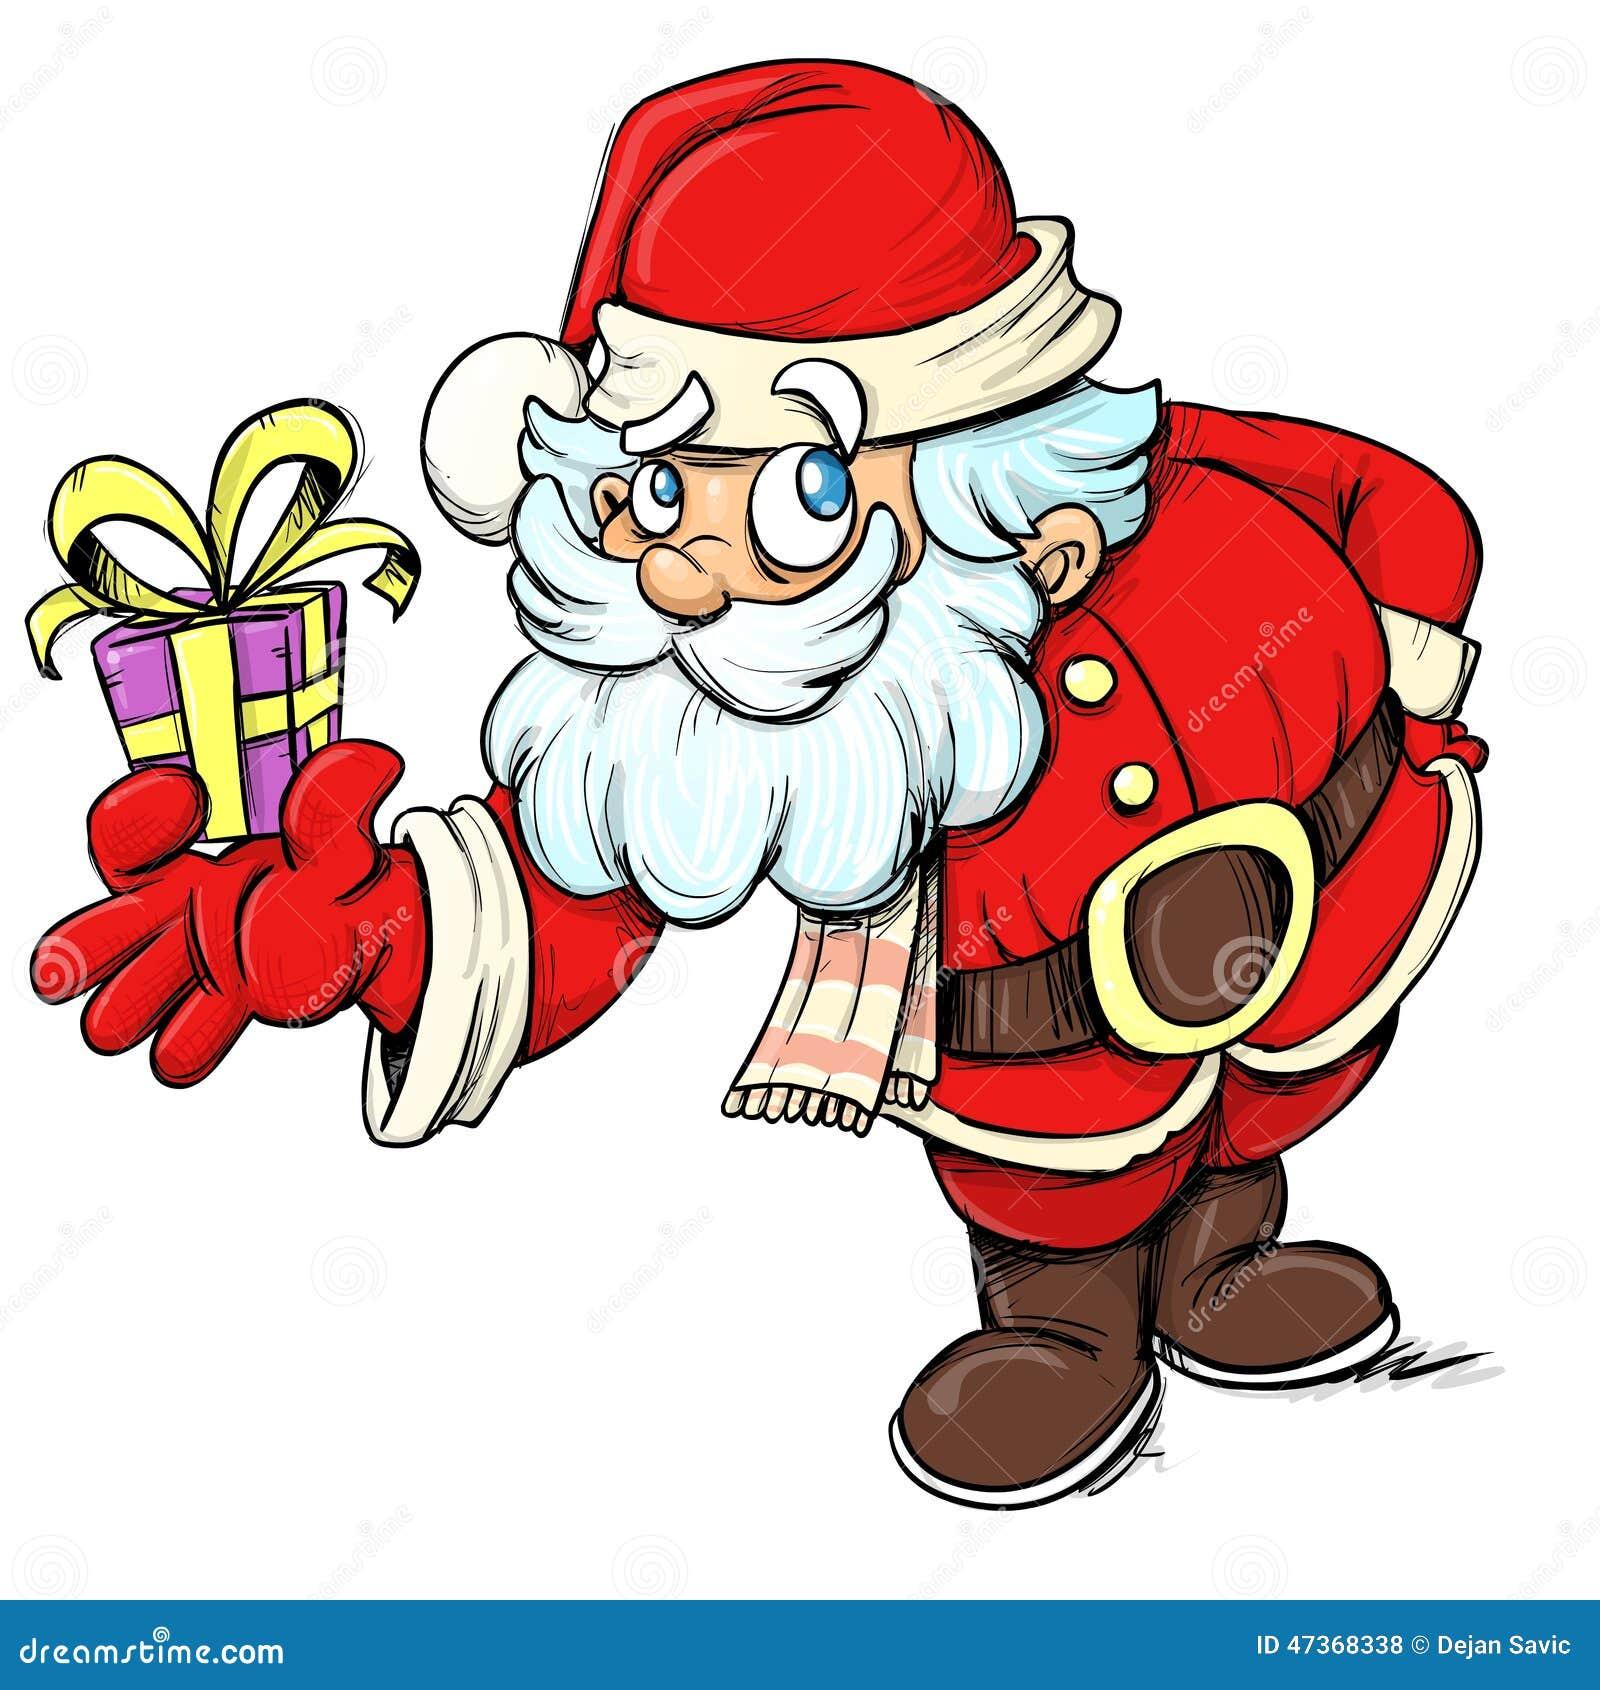 Cartoon Santa Clause giving a present